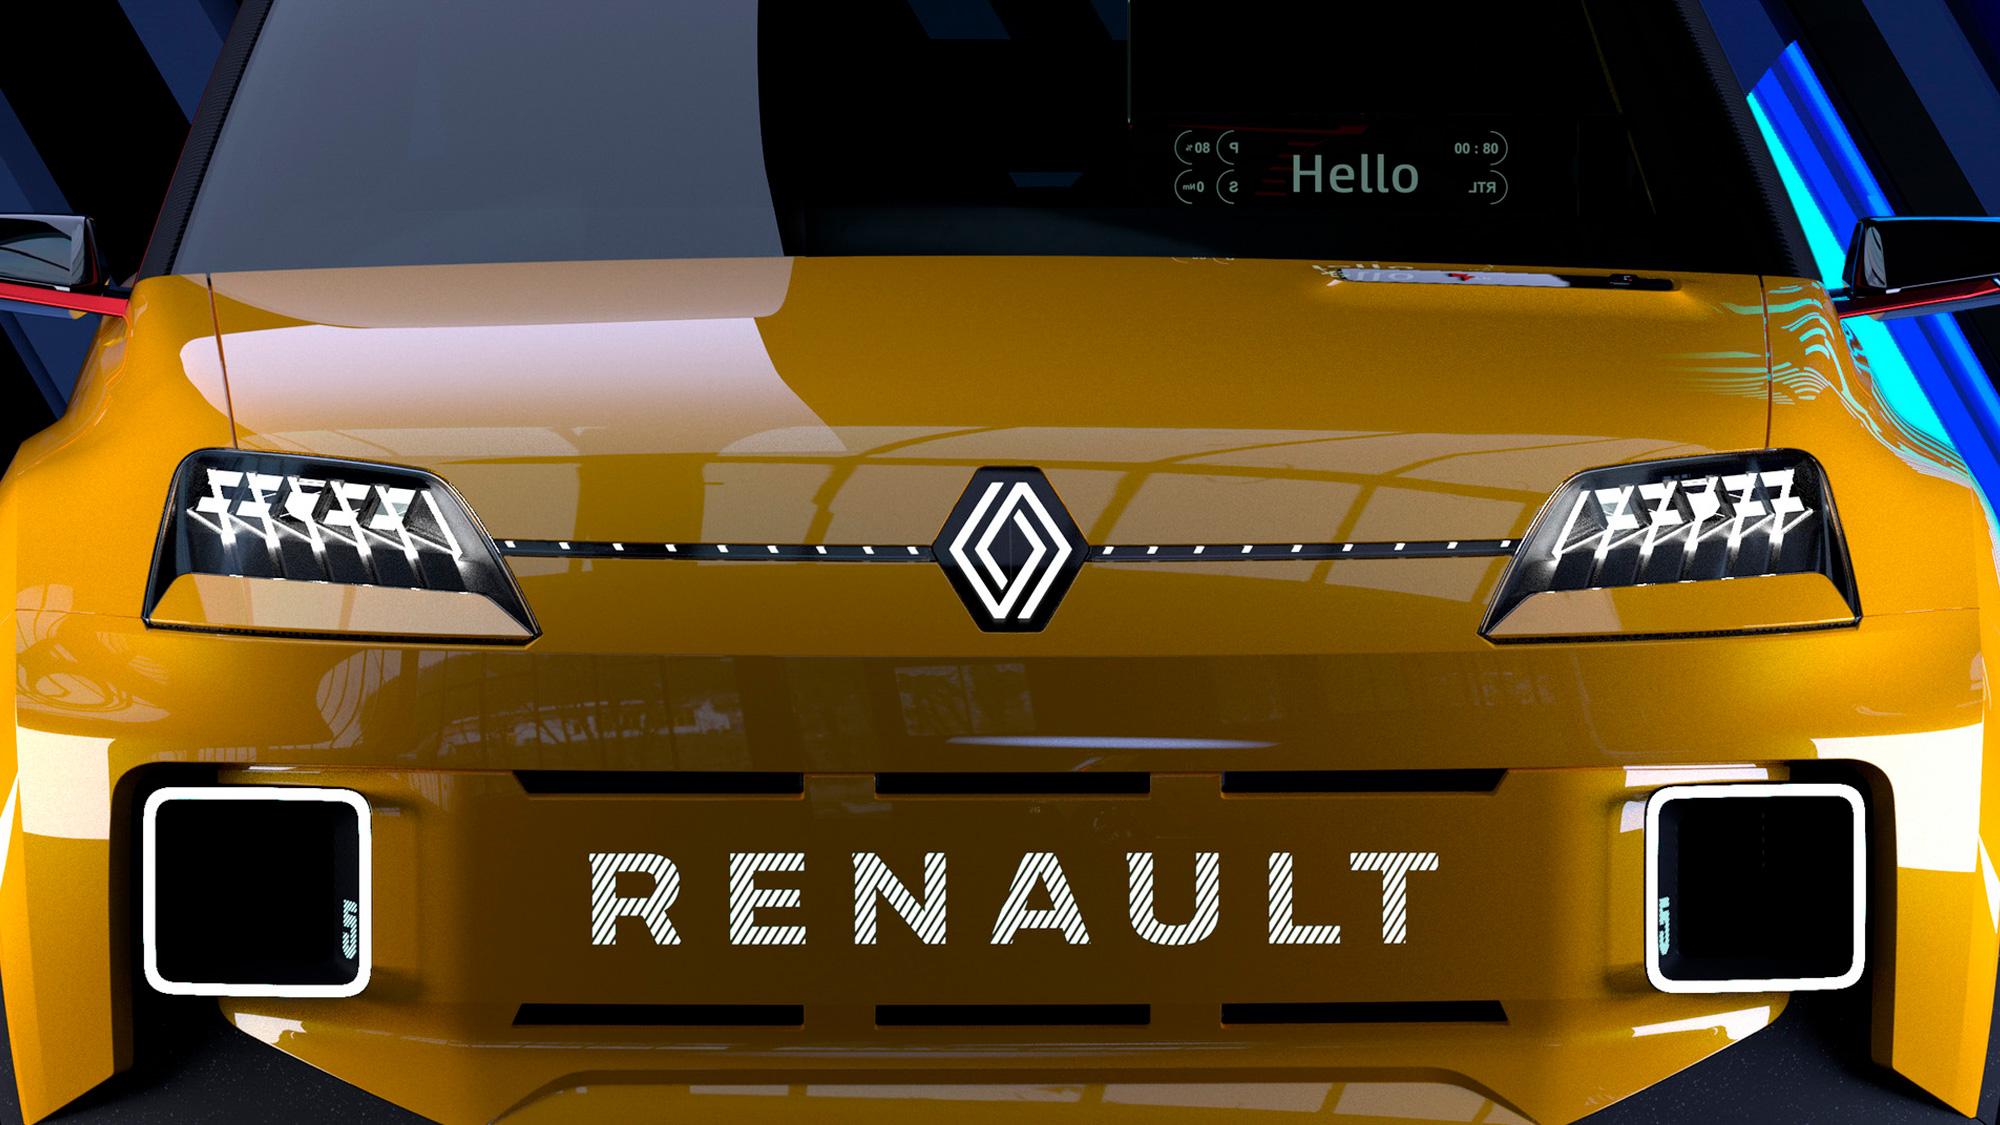 Auto brands trend: Renault 5